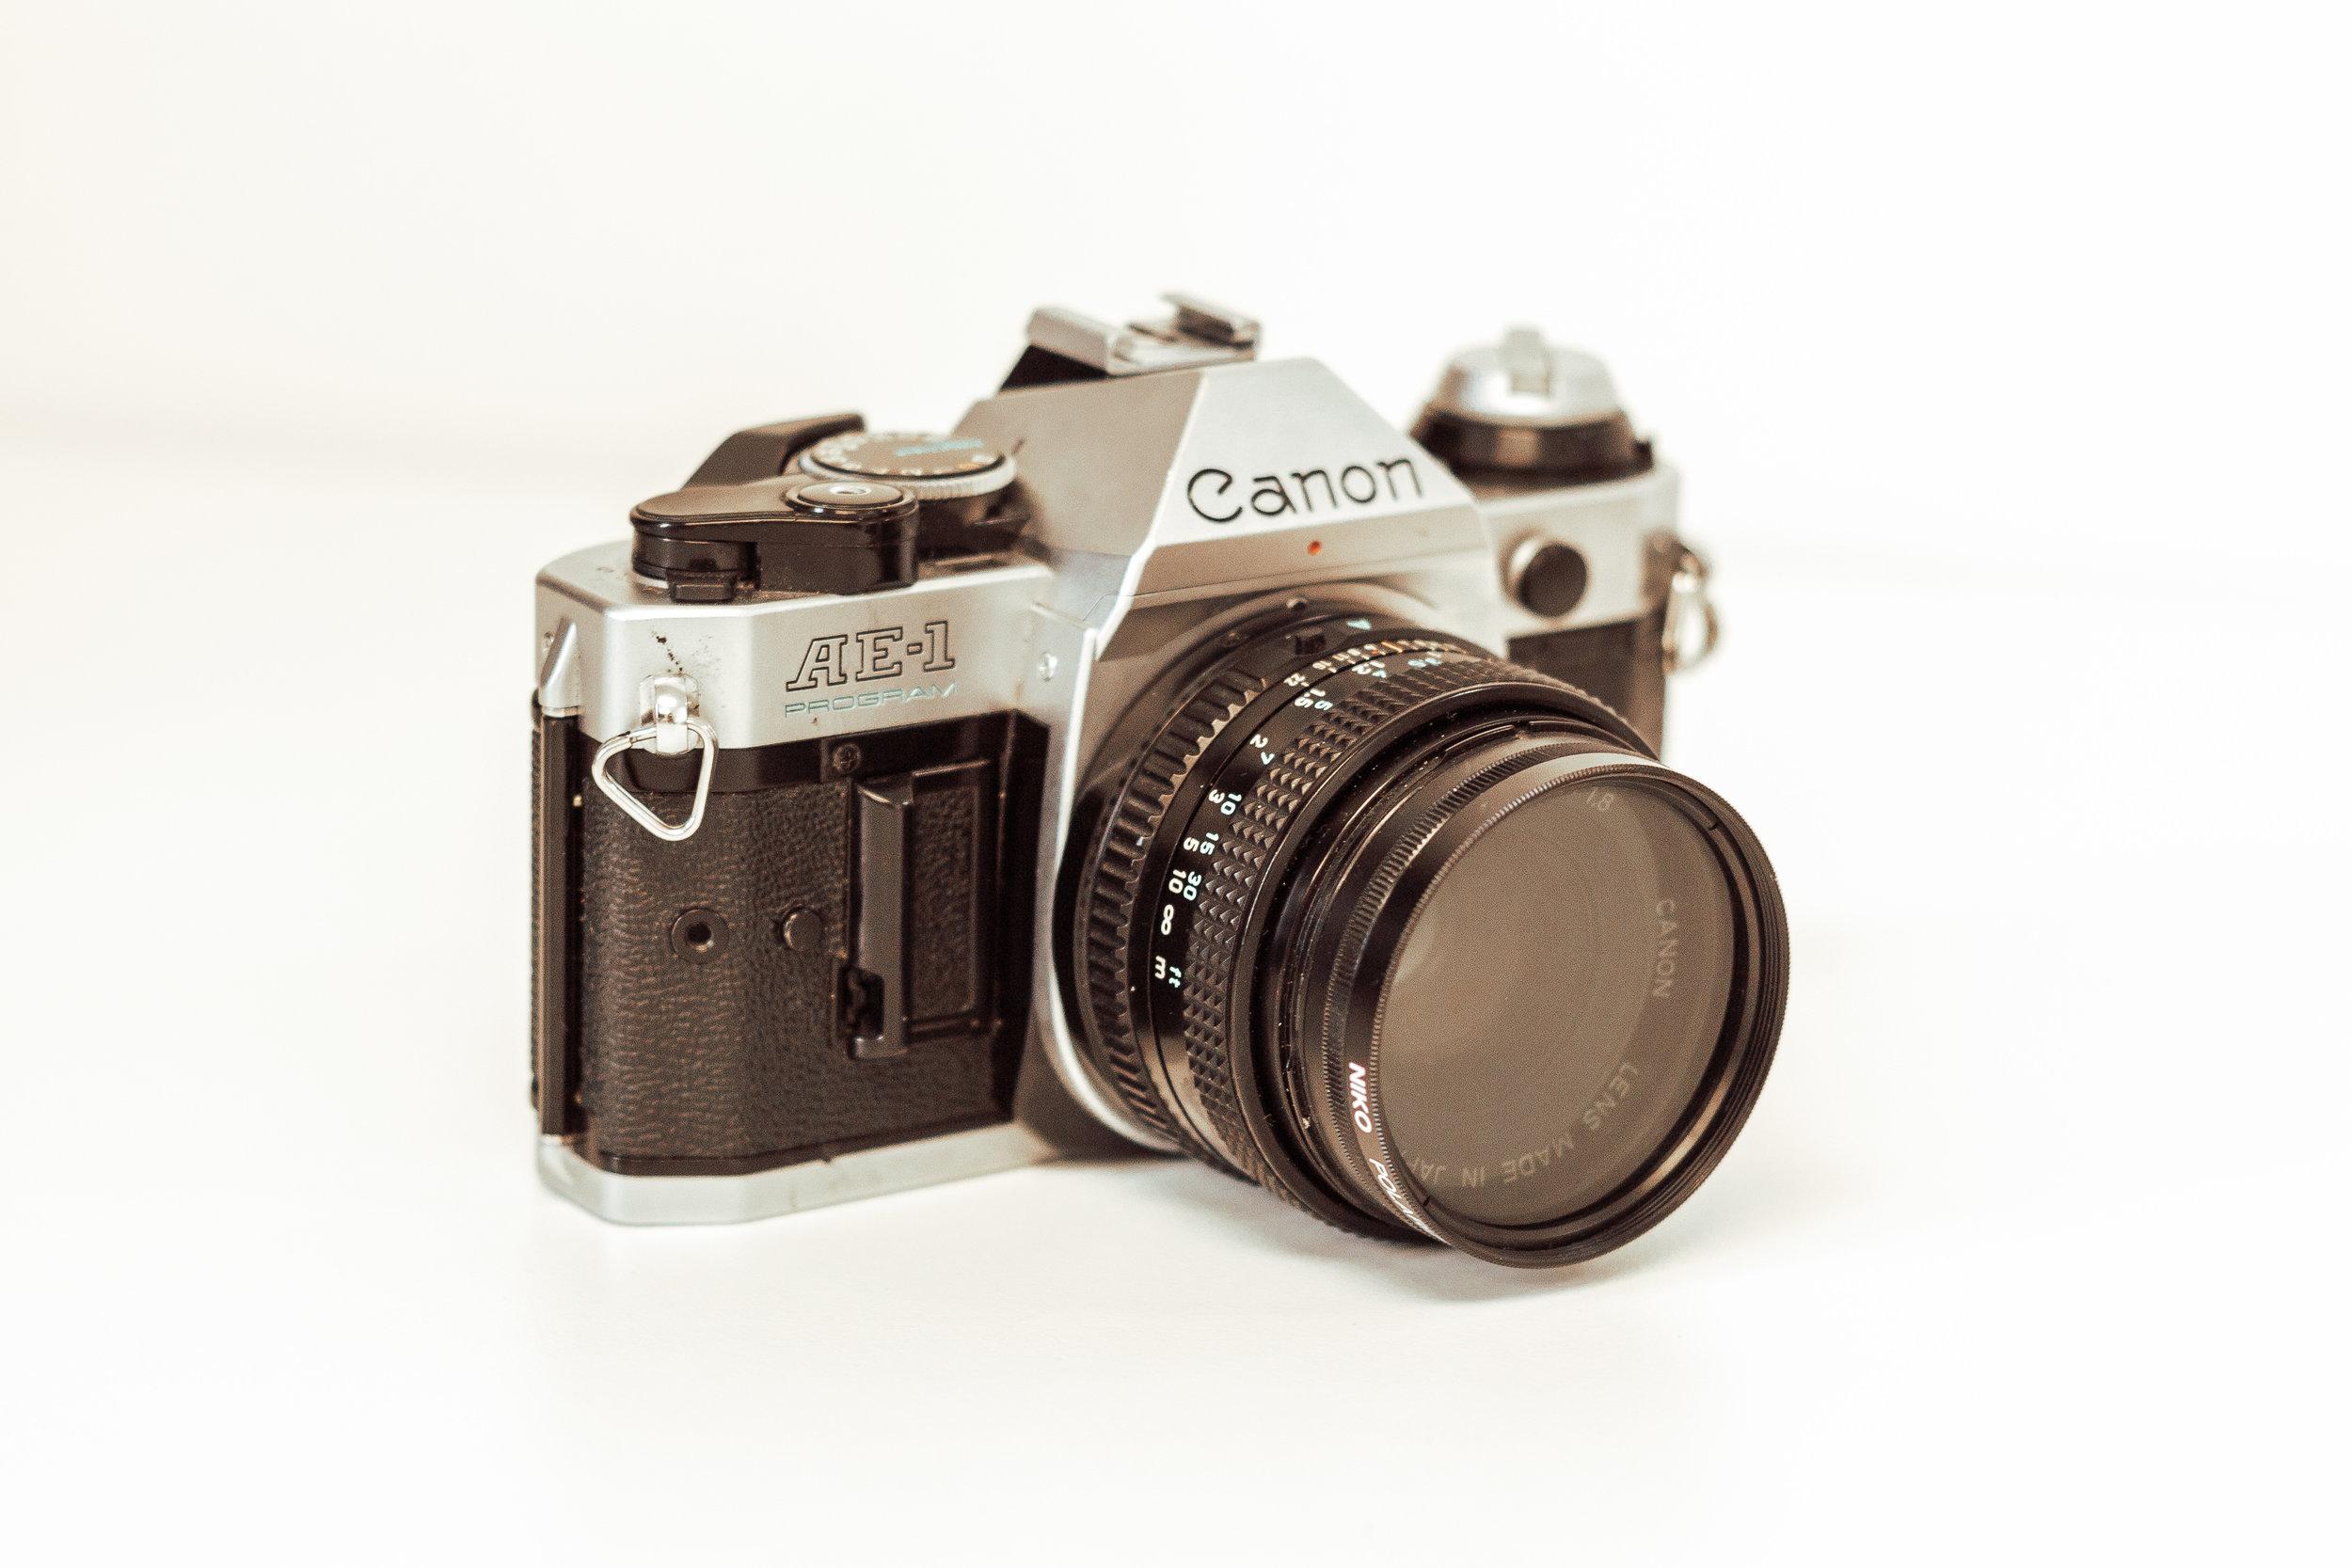 My new (to me) Canon AE-1 Program